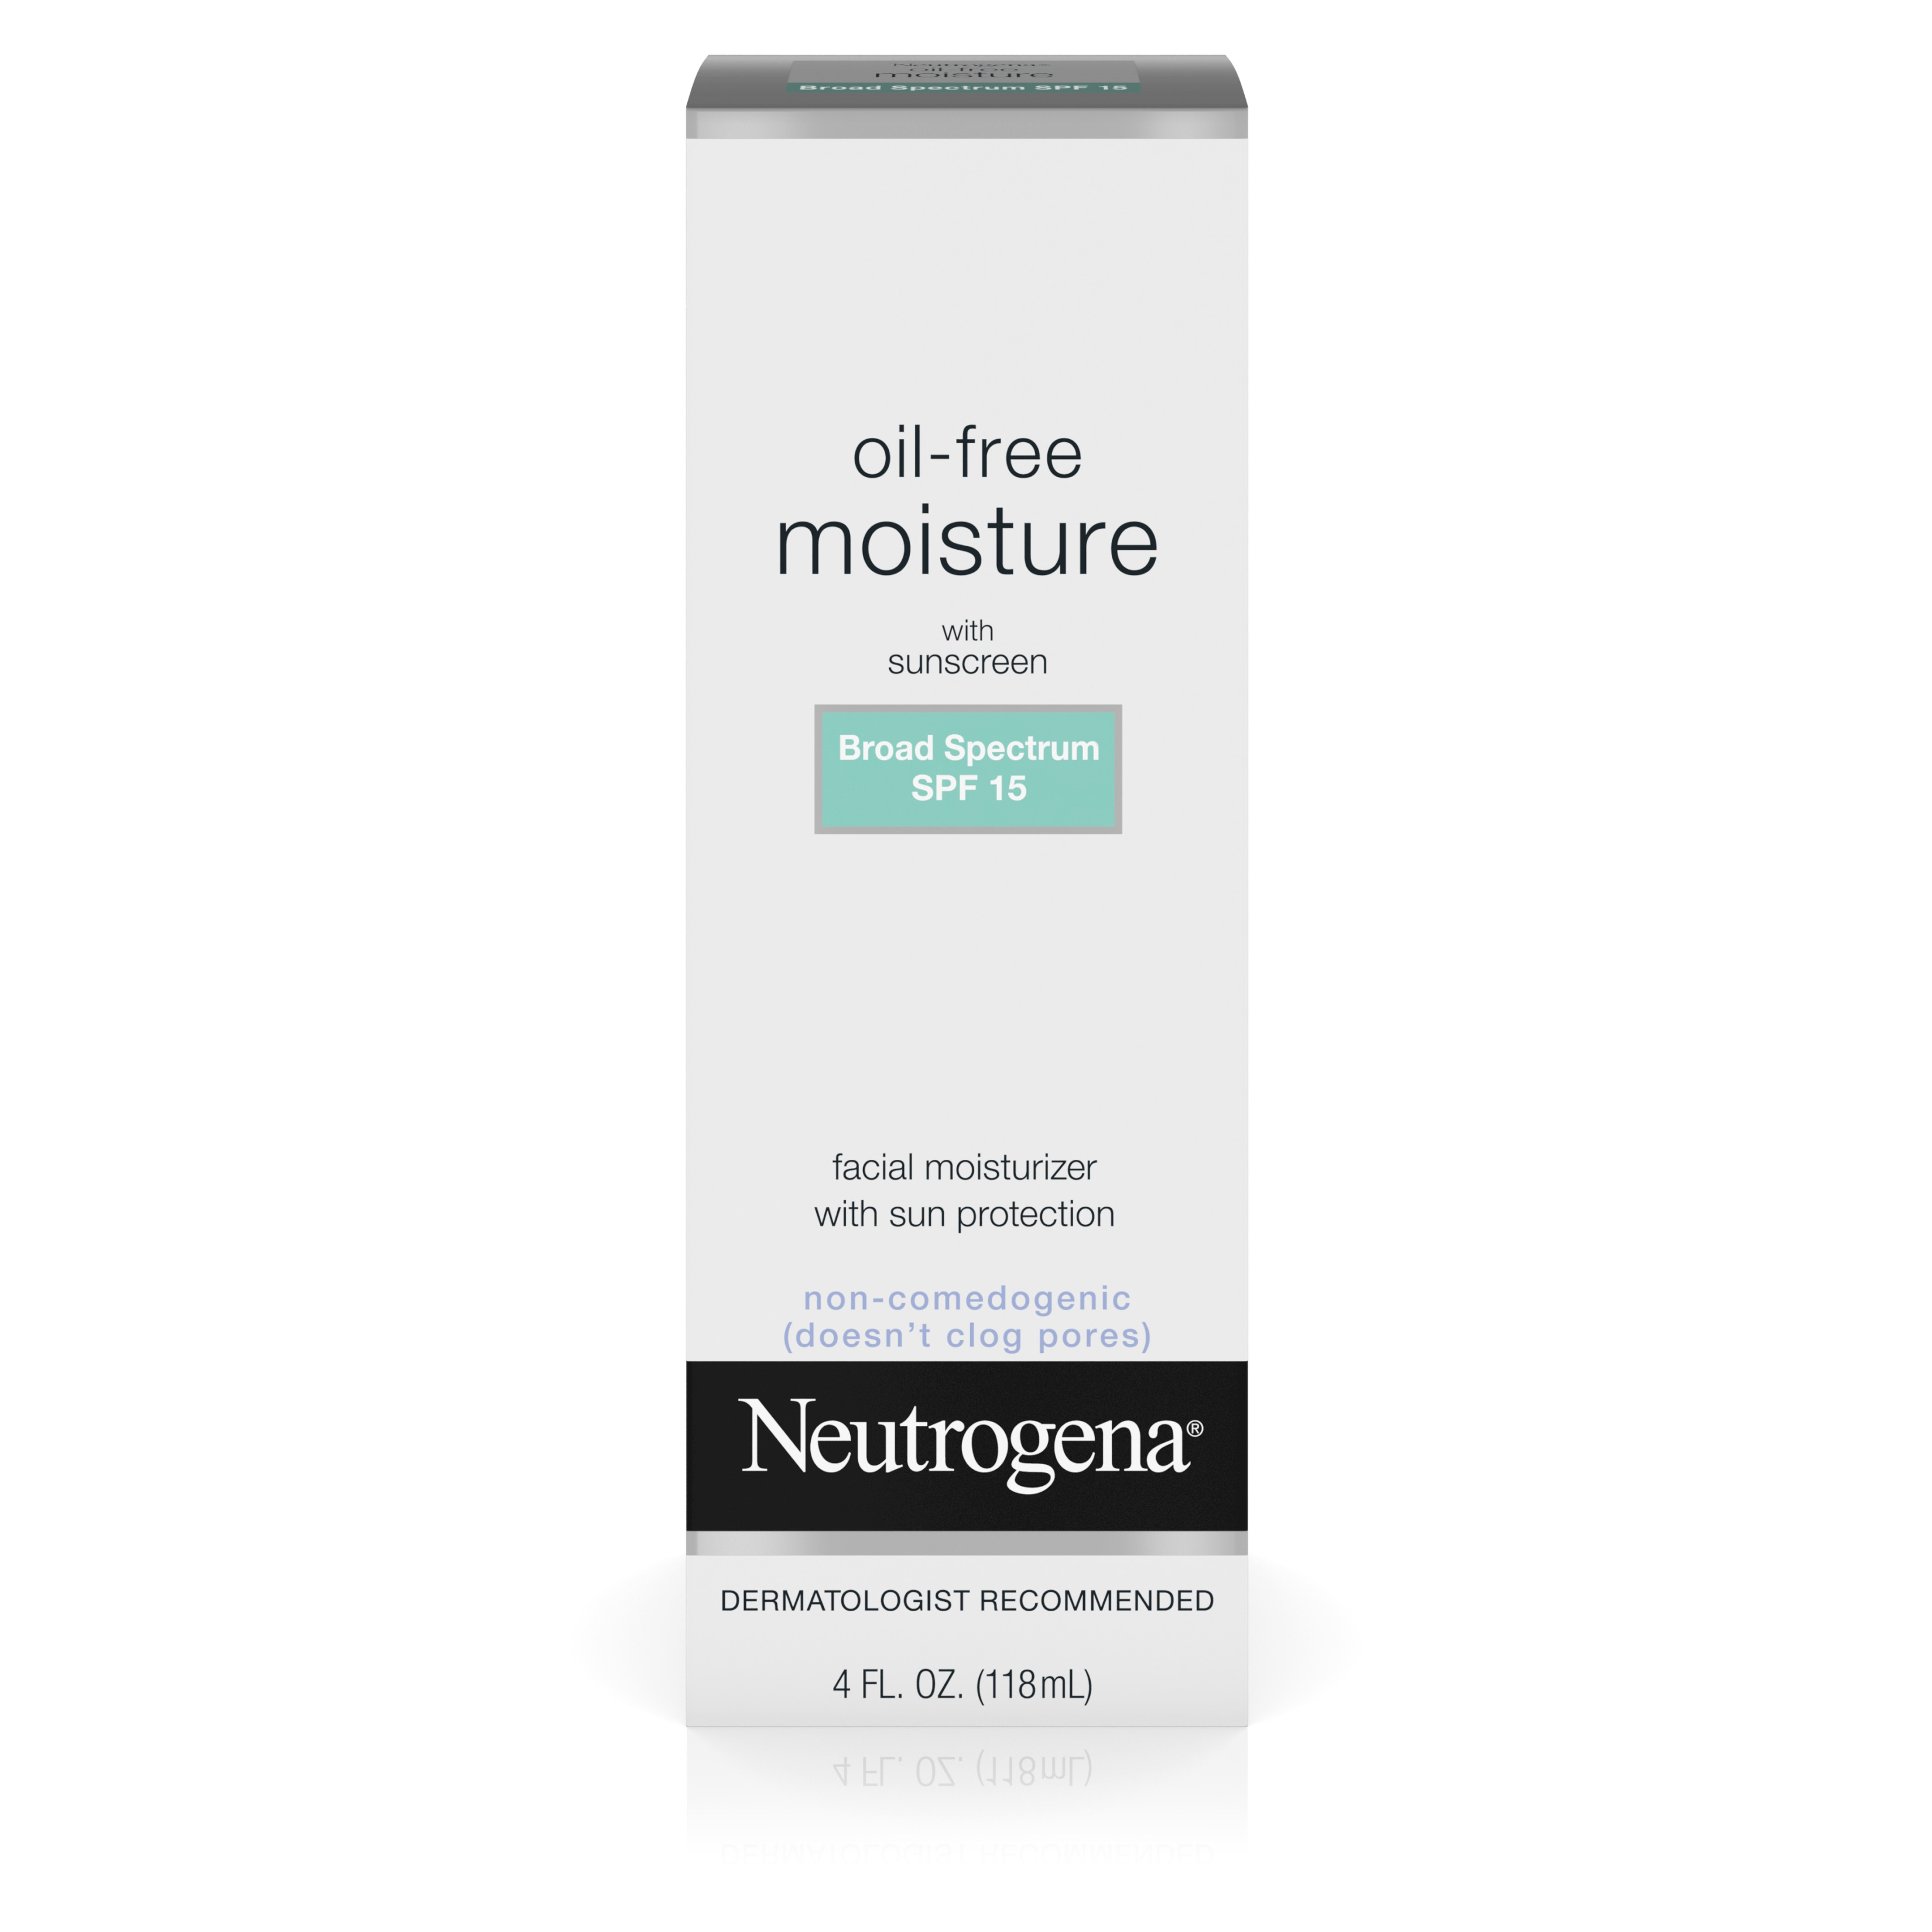 Neutrogena Oil-Free Moisture With Broad Spectrum Spf 15 Sunscreen, 4 Fl. Oz. - Walmart.com